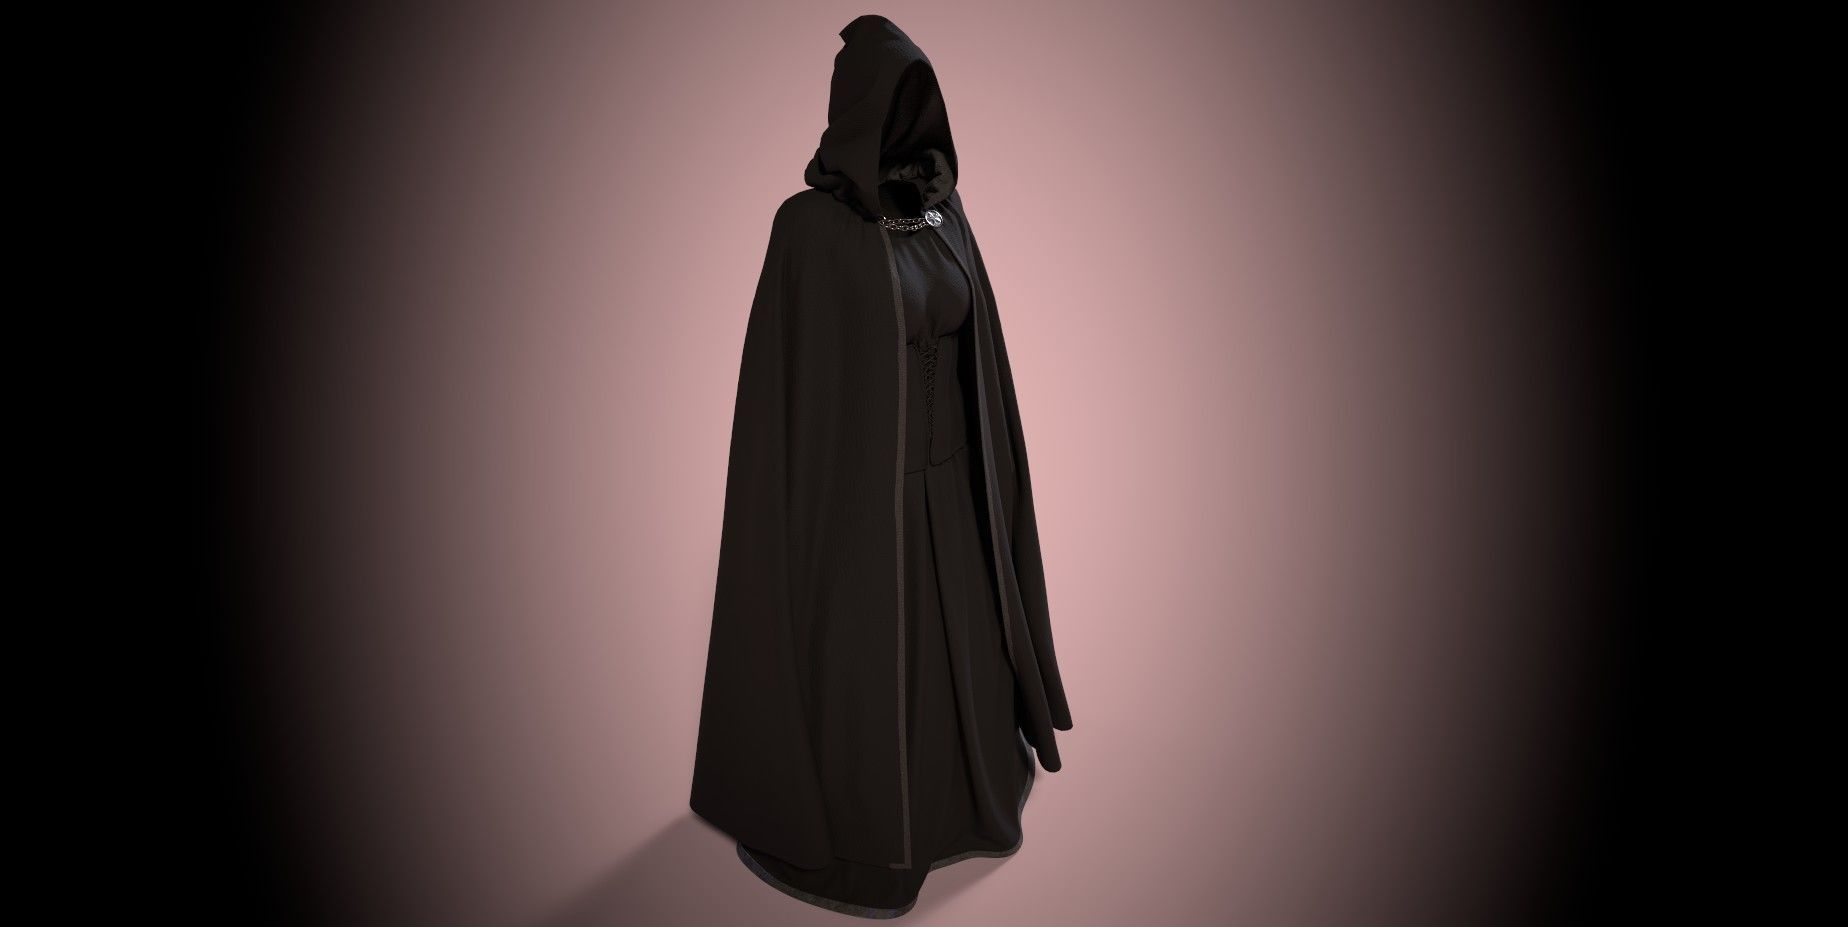 Dark Cloak with Corset